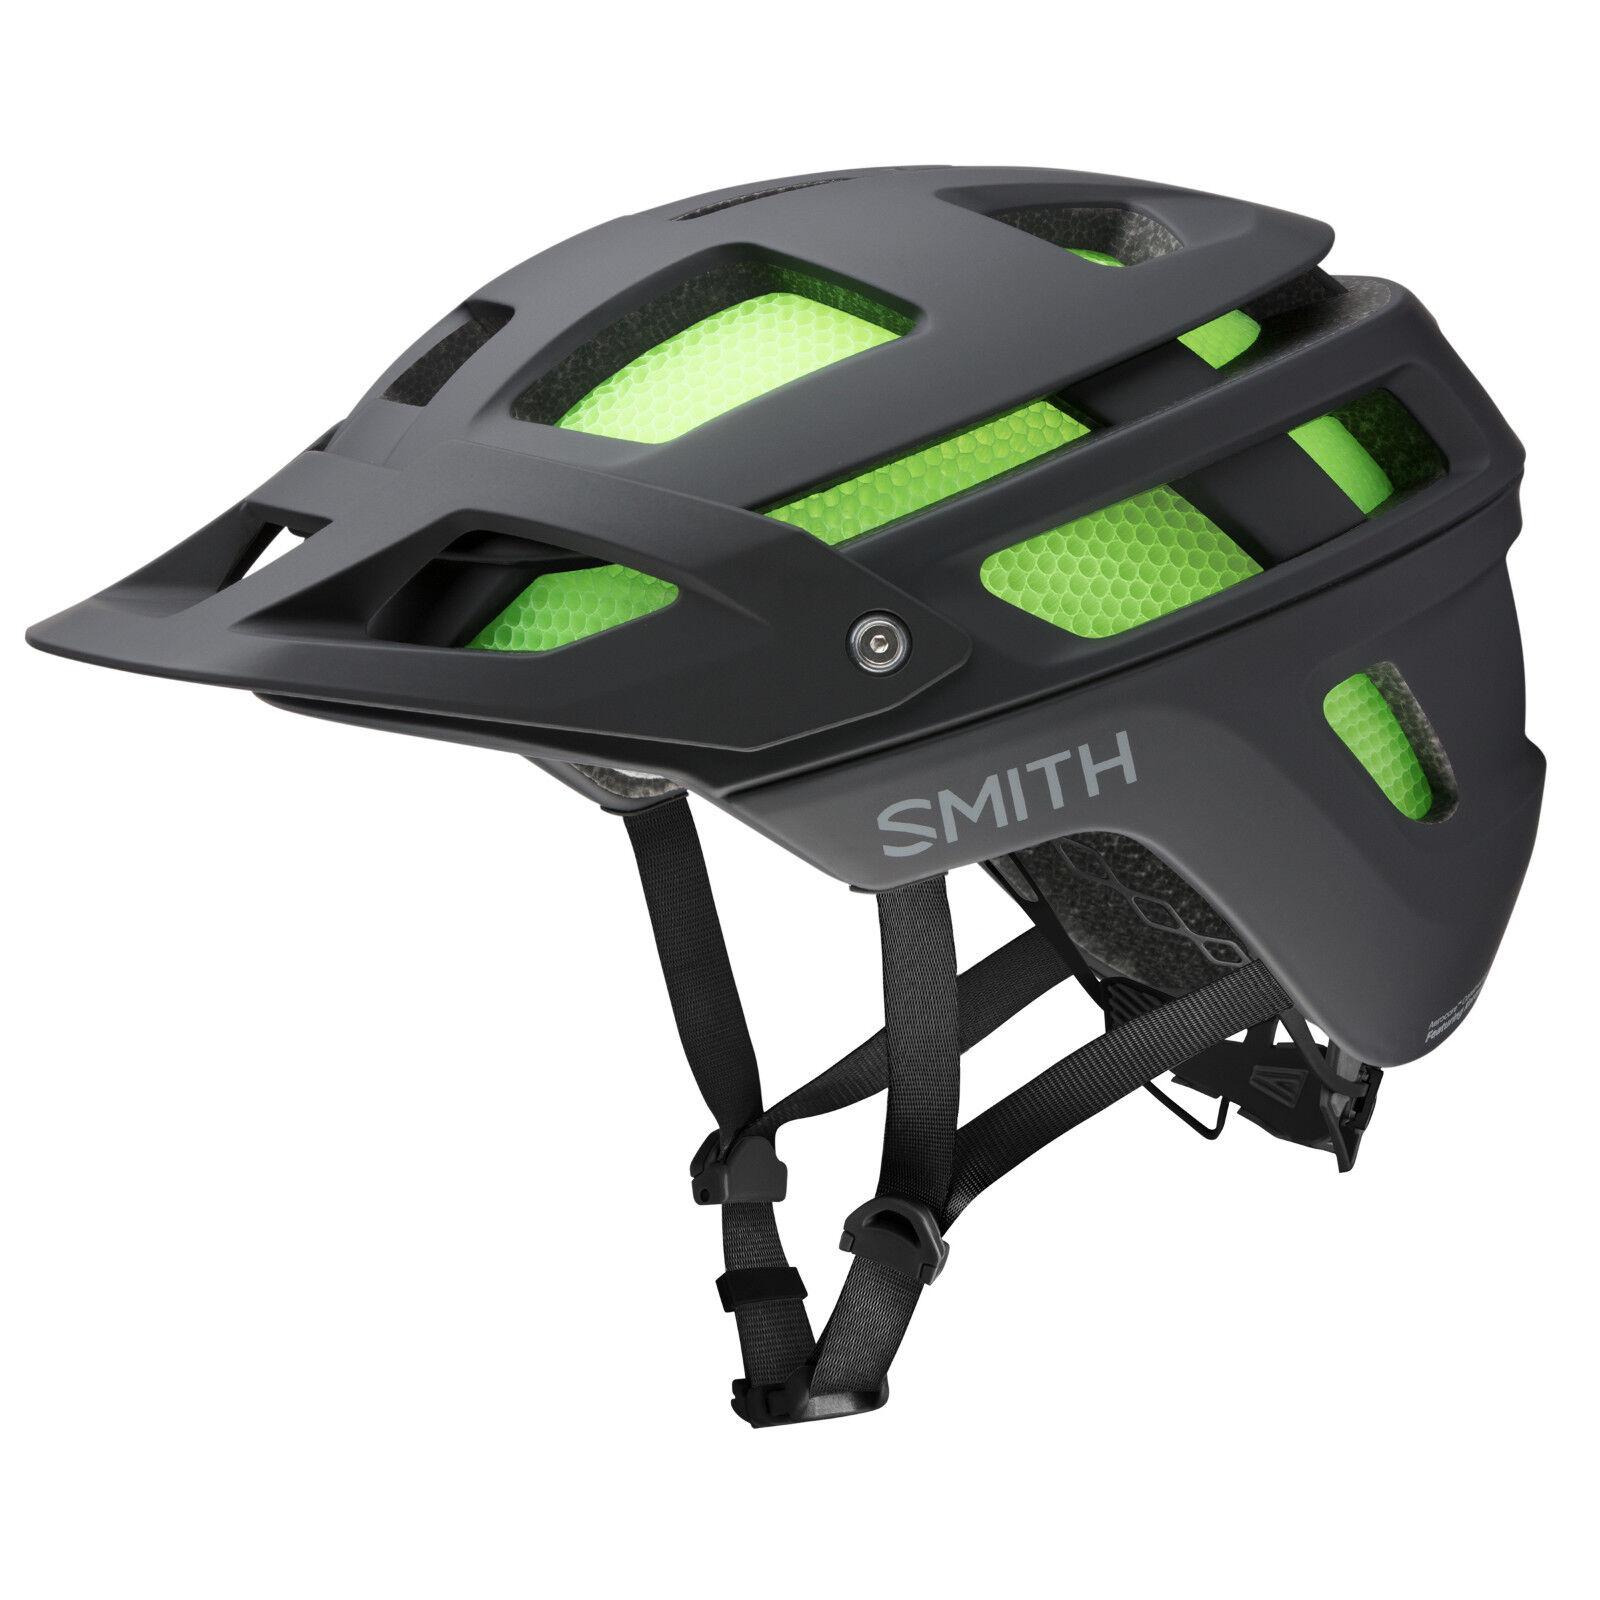 Smith Forefront  2 Mips Bicicleta Mountainbike MTB Casco black Mate S M L  no minimum